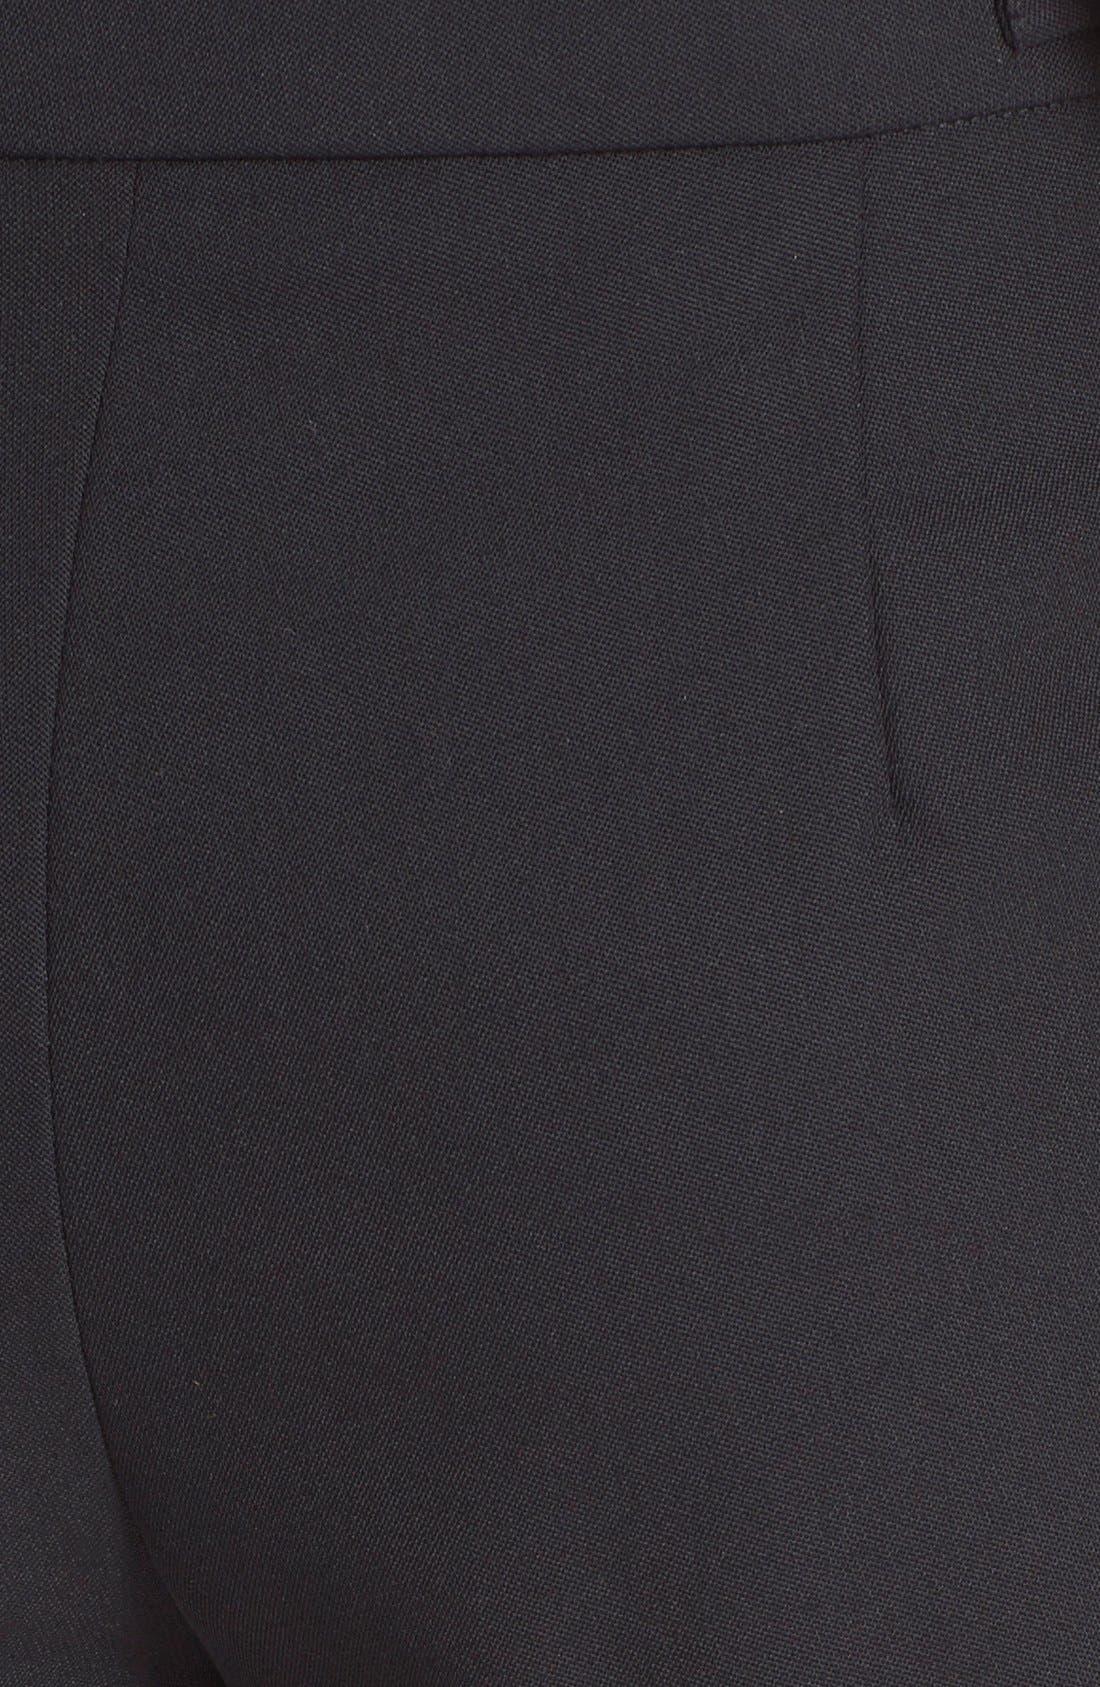 Alternate Image 3  - Alexander Wang Pleated Wool Shorts